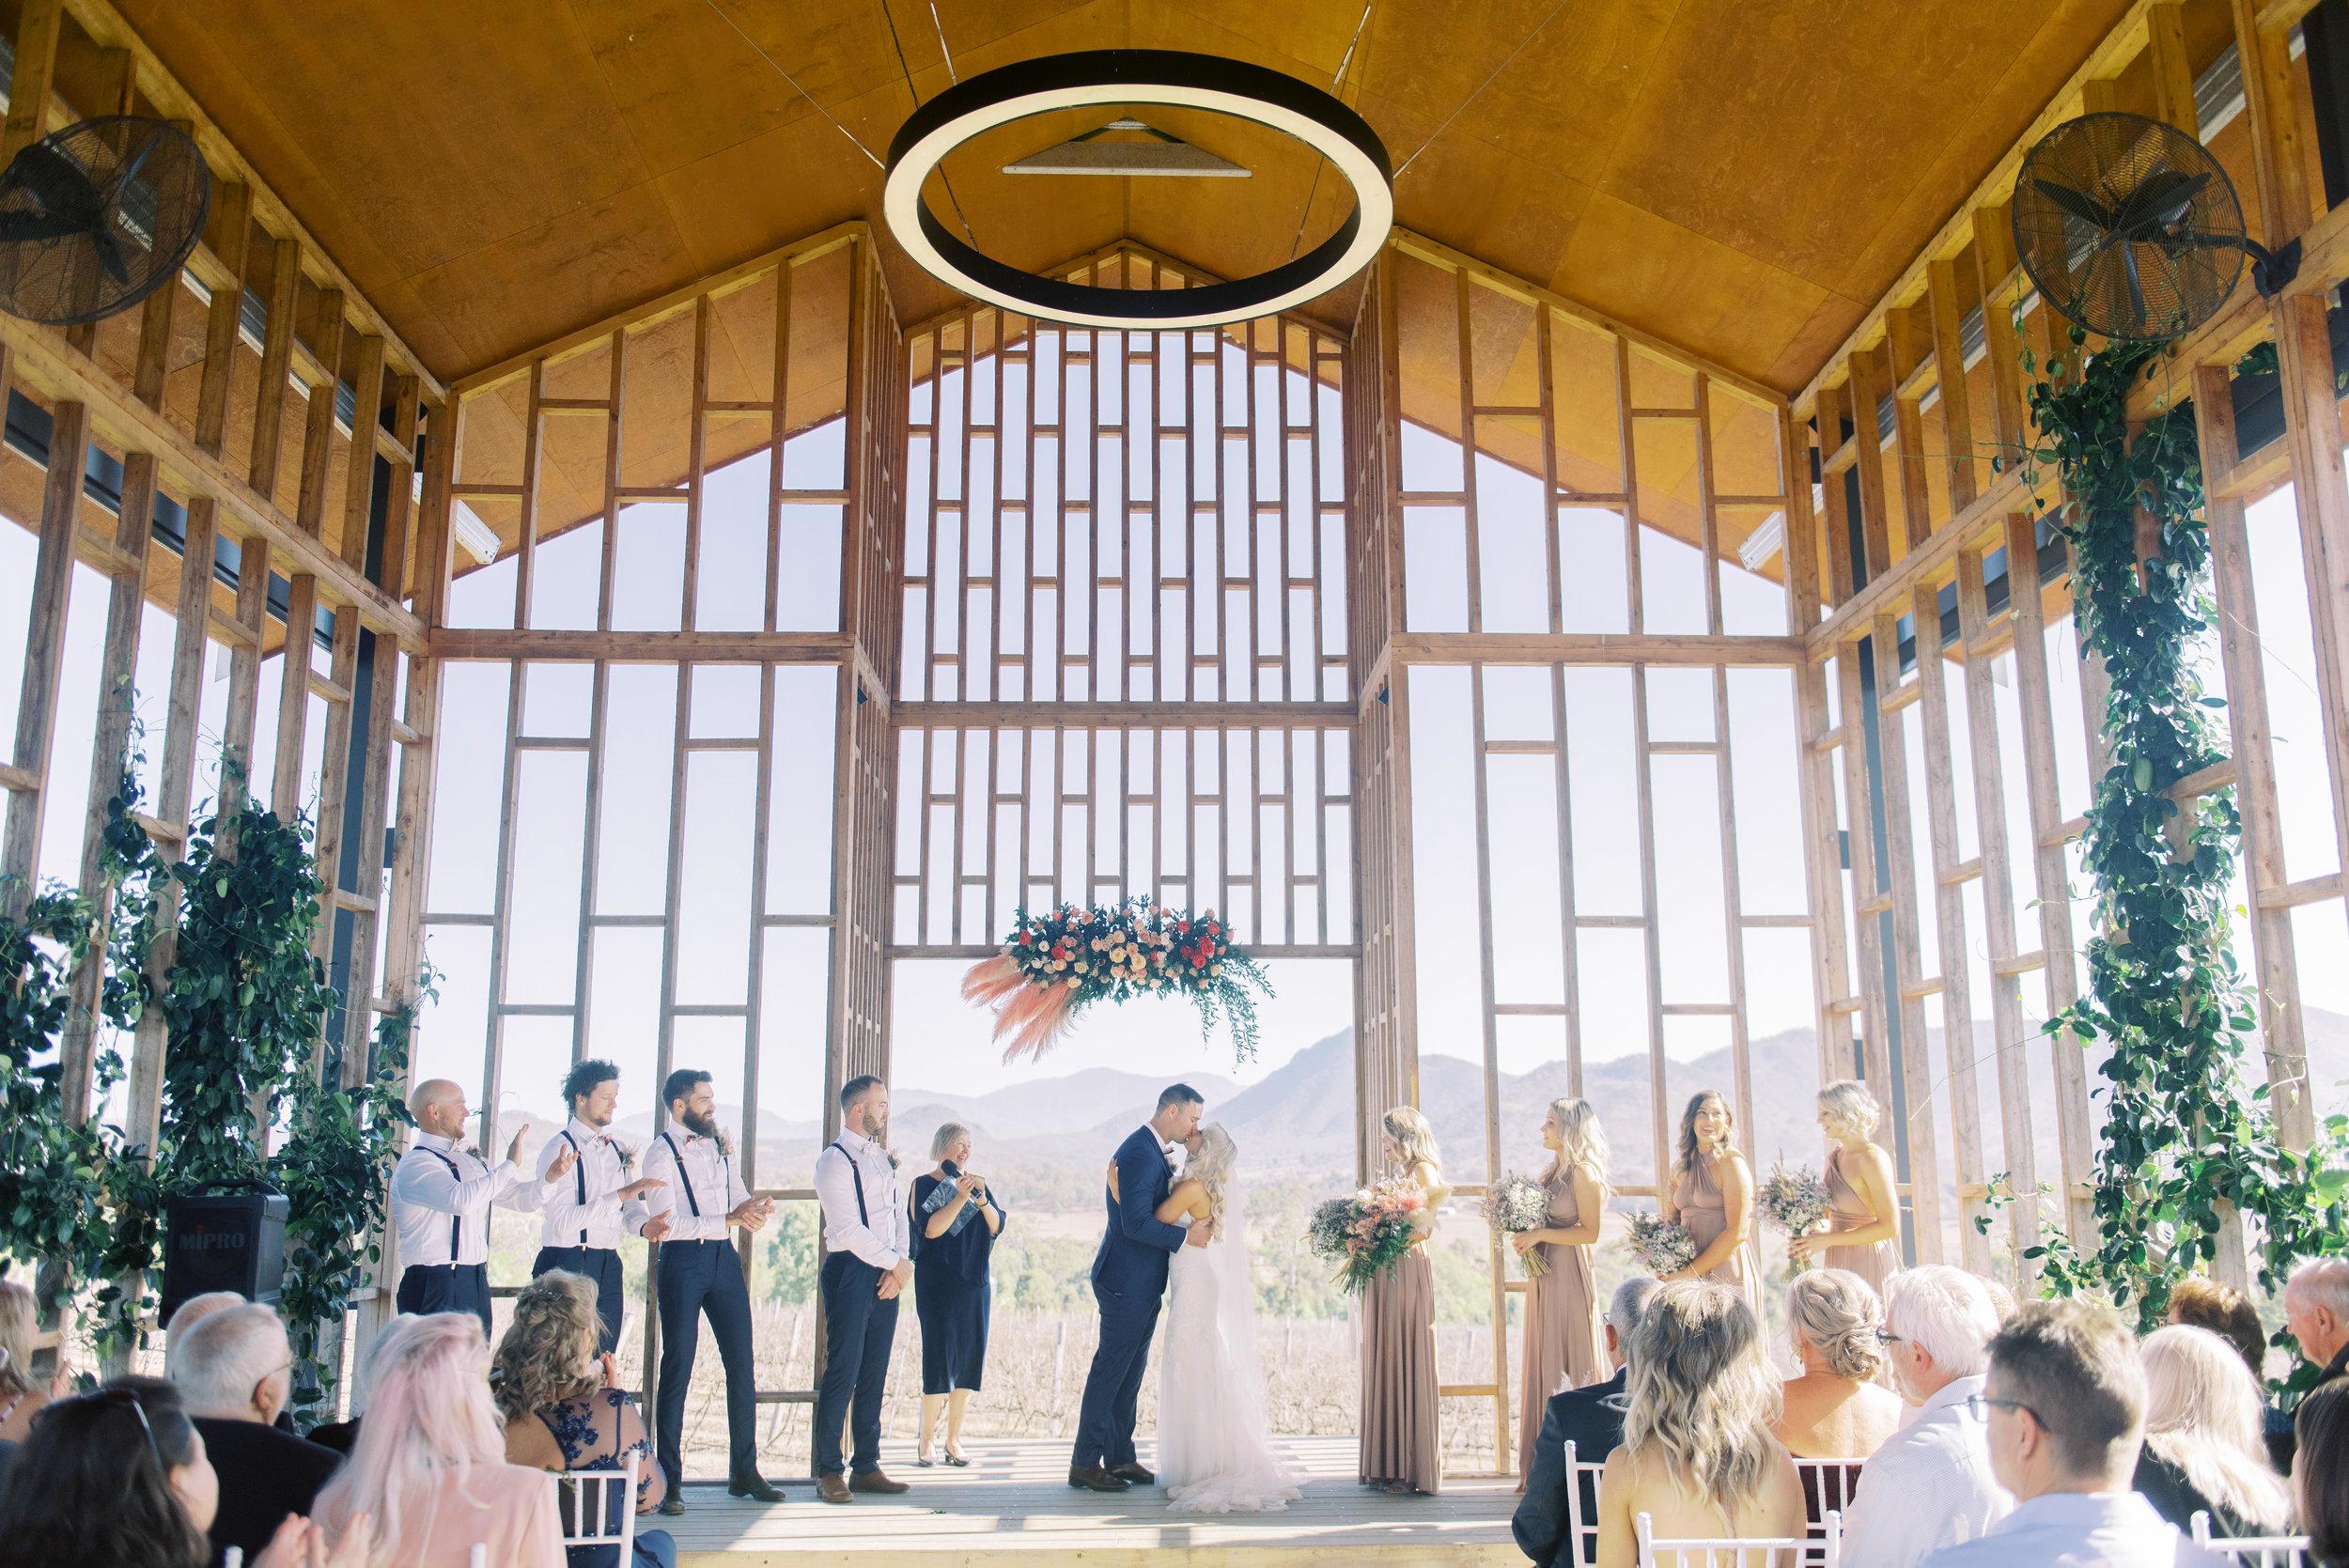 Kooroomba-Vineyard-Lavender-Farm-Wedding-Fine-Art-Lauren-Olivia-44.jpg